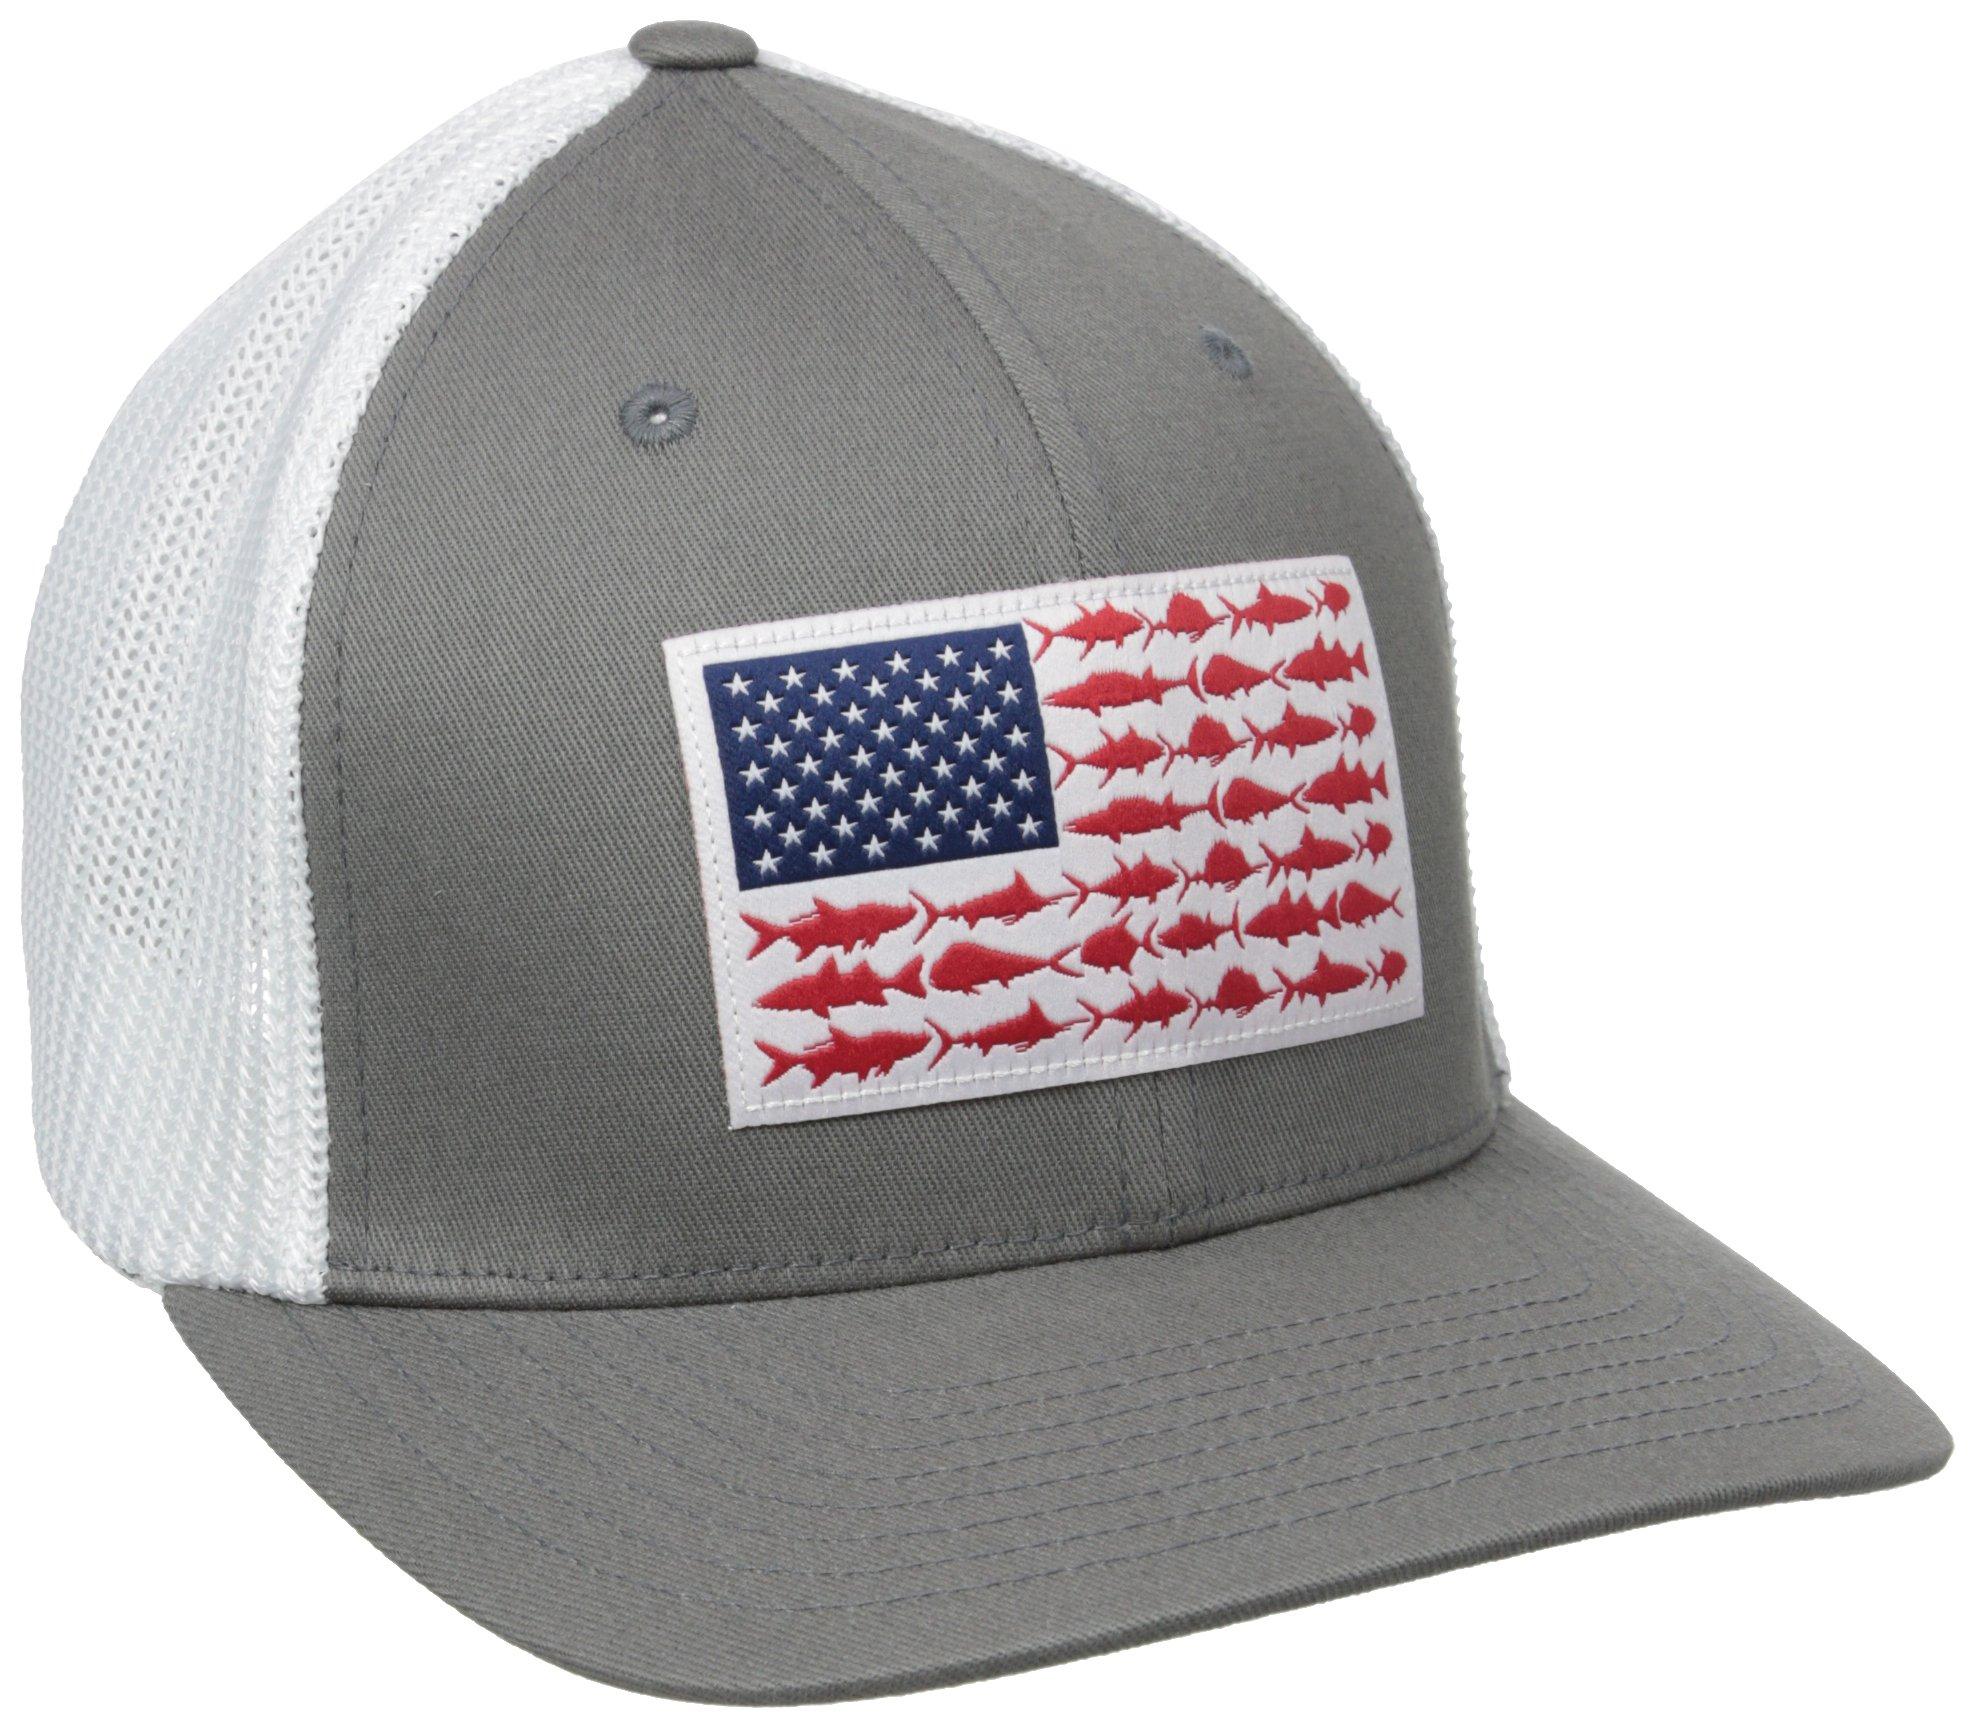 Columbia PFG Mesh Ball Cap, Titanium/Fish Flag, Large/X-Large